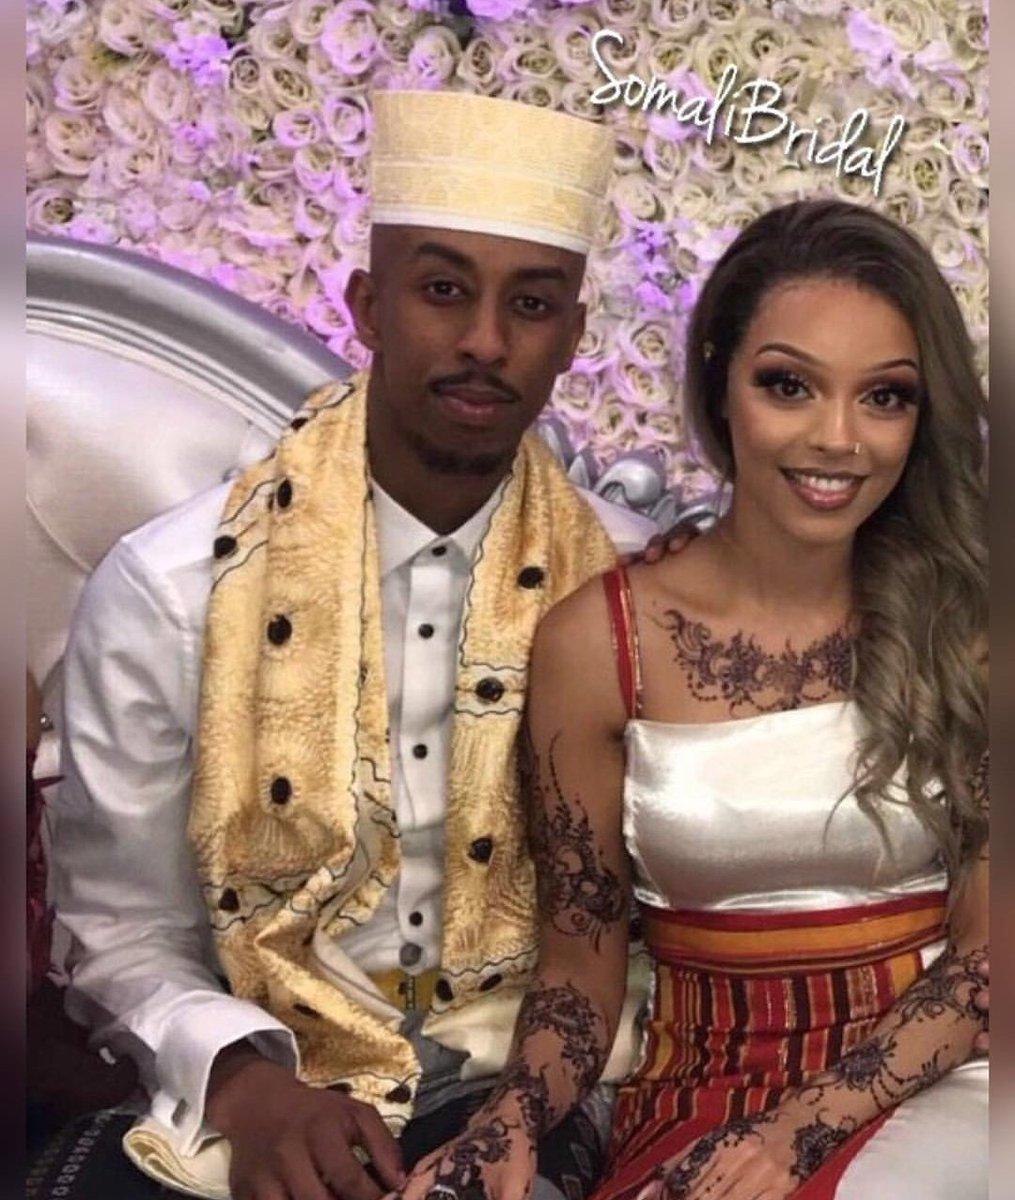 somaliwedding hashtag on Twitter